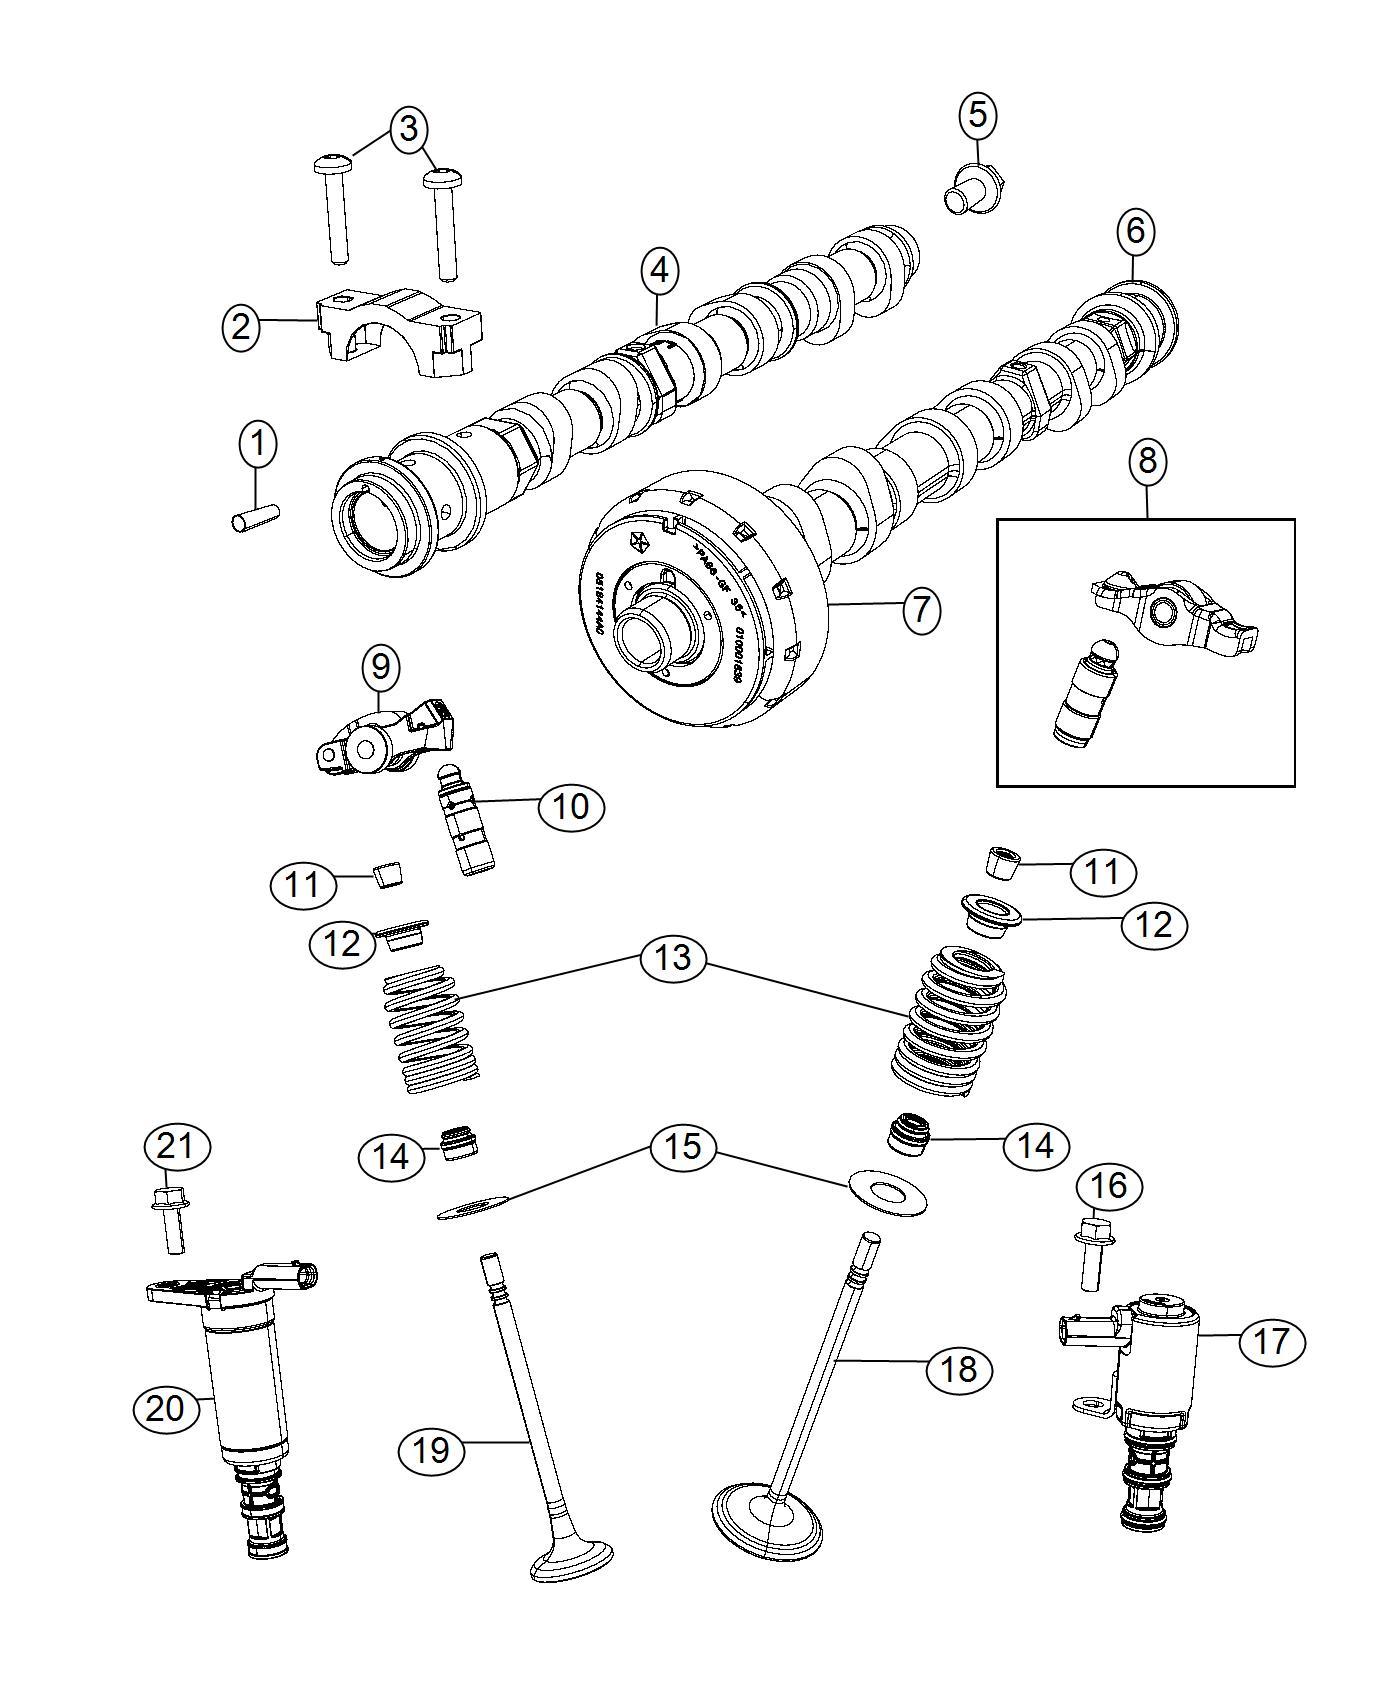 2017 Chrysler Pacifica Solenoid. Variable valve lift